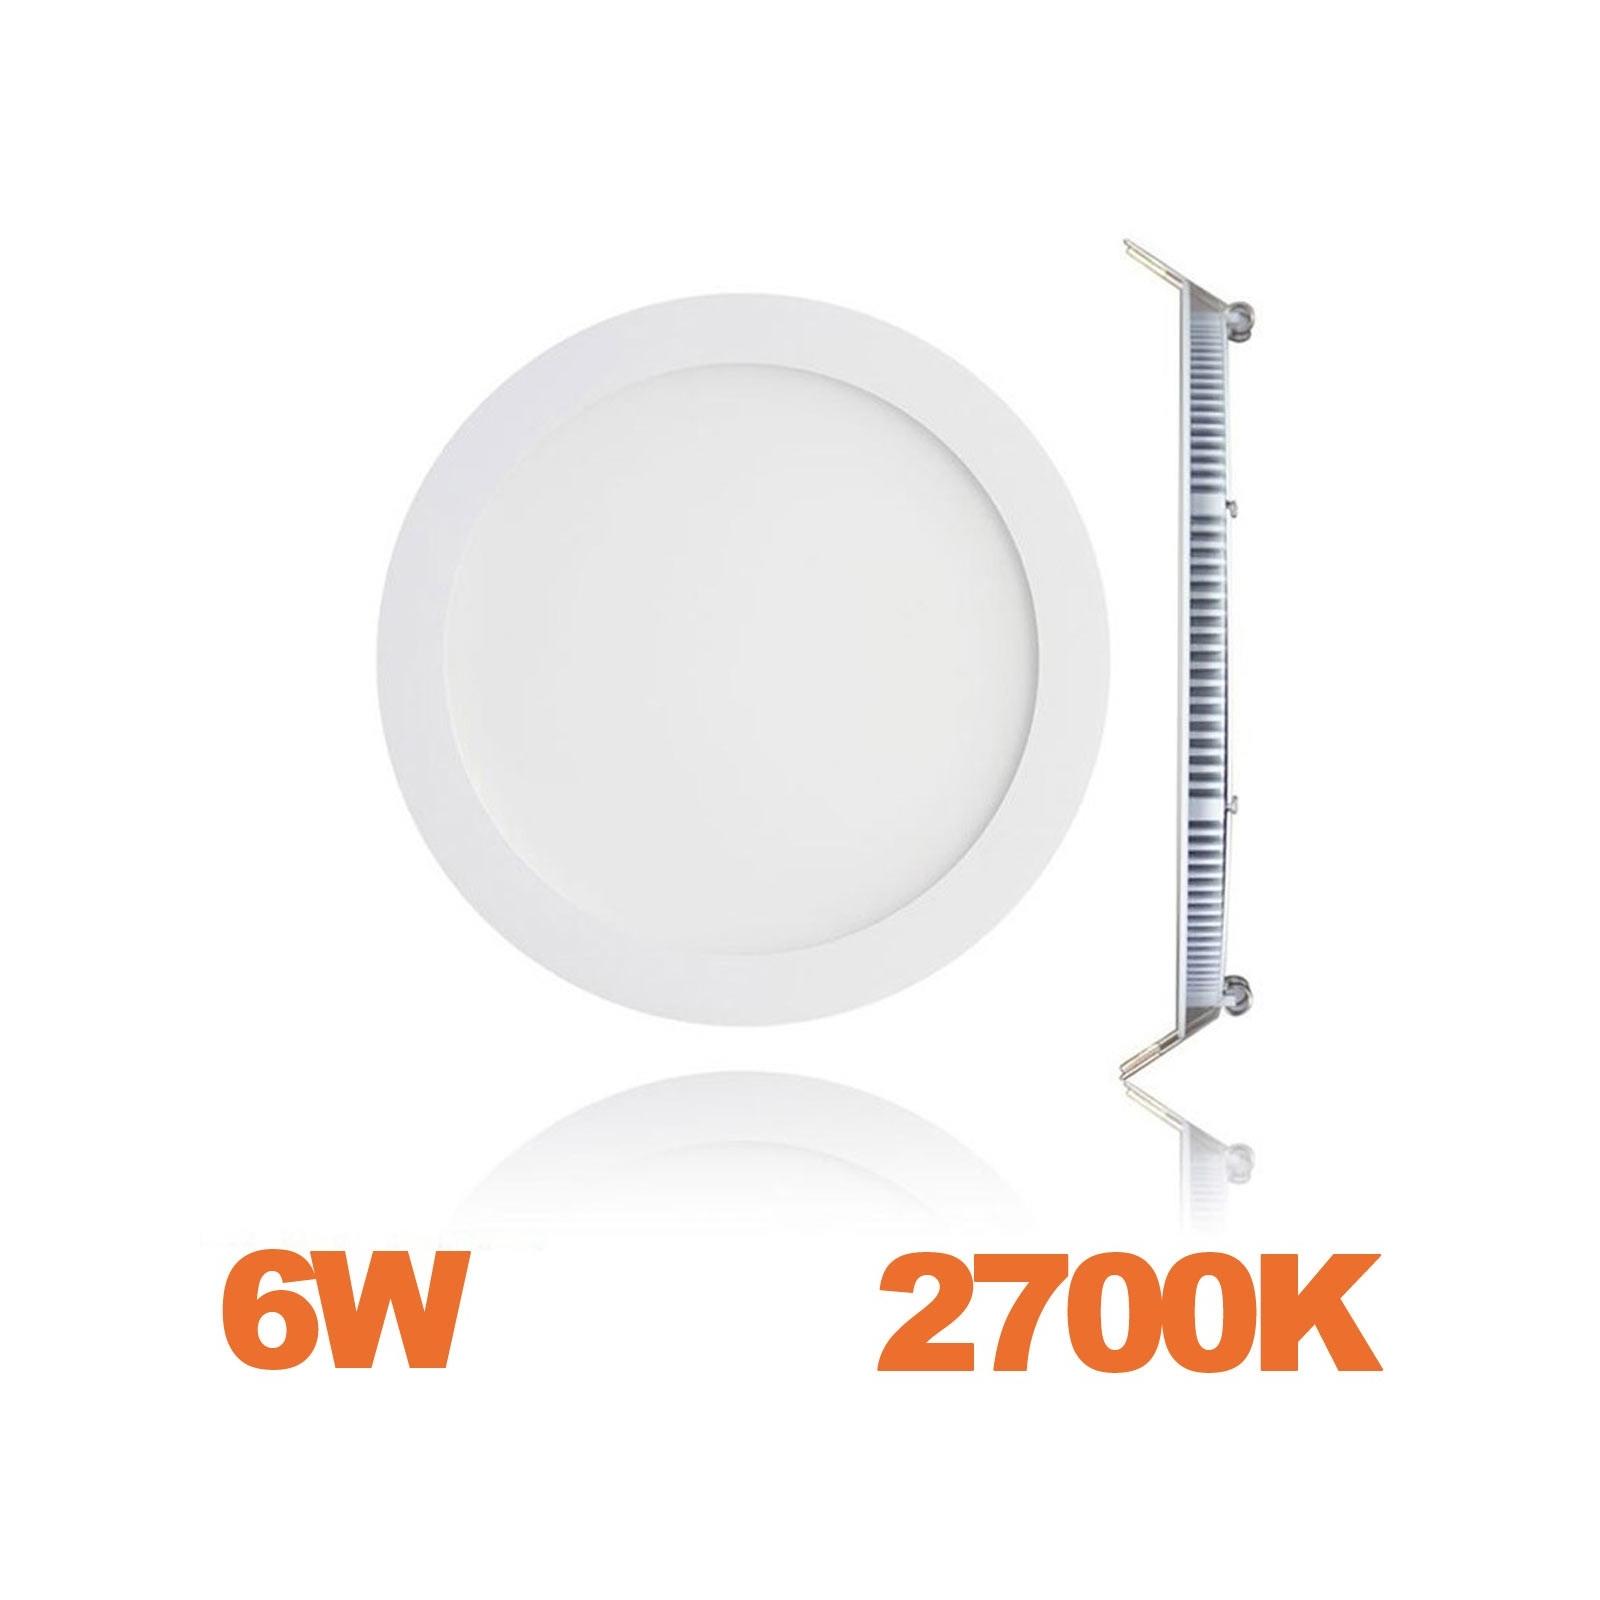 Spot Encastrable LED Downlight Panel Extra-Plat 6W Blanc Chaud 2700K